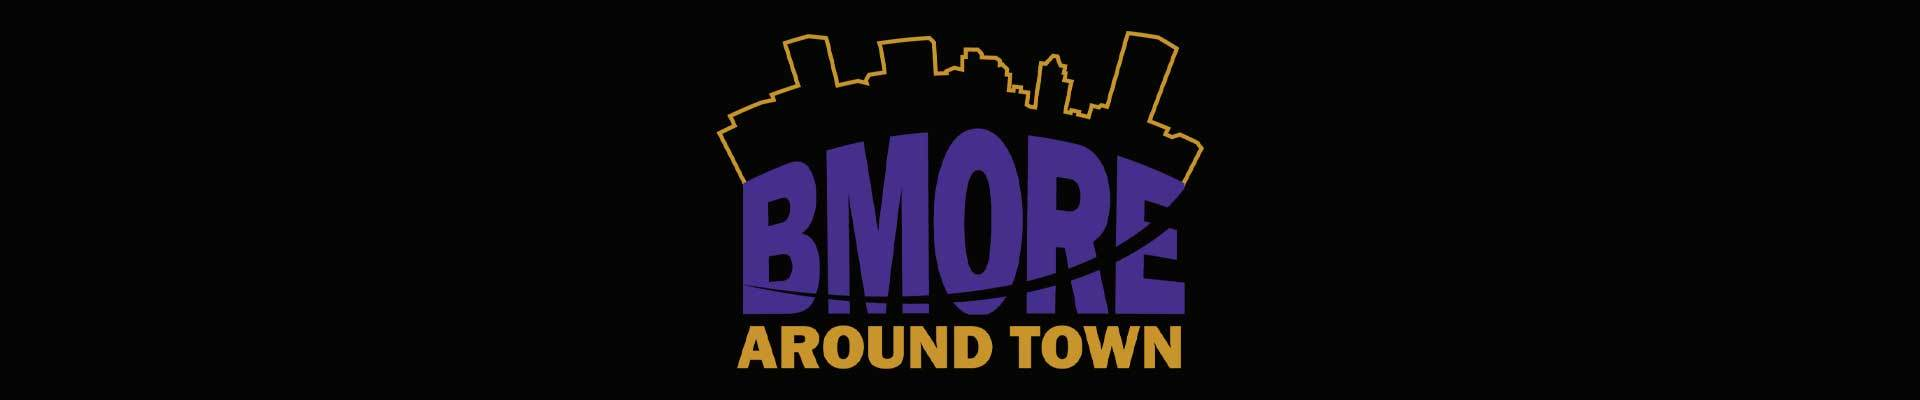 Baltimore Ravens sweepstakes